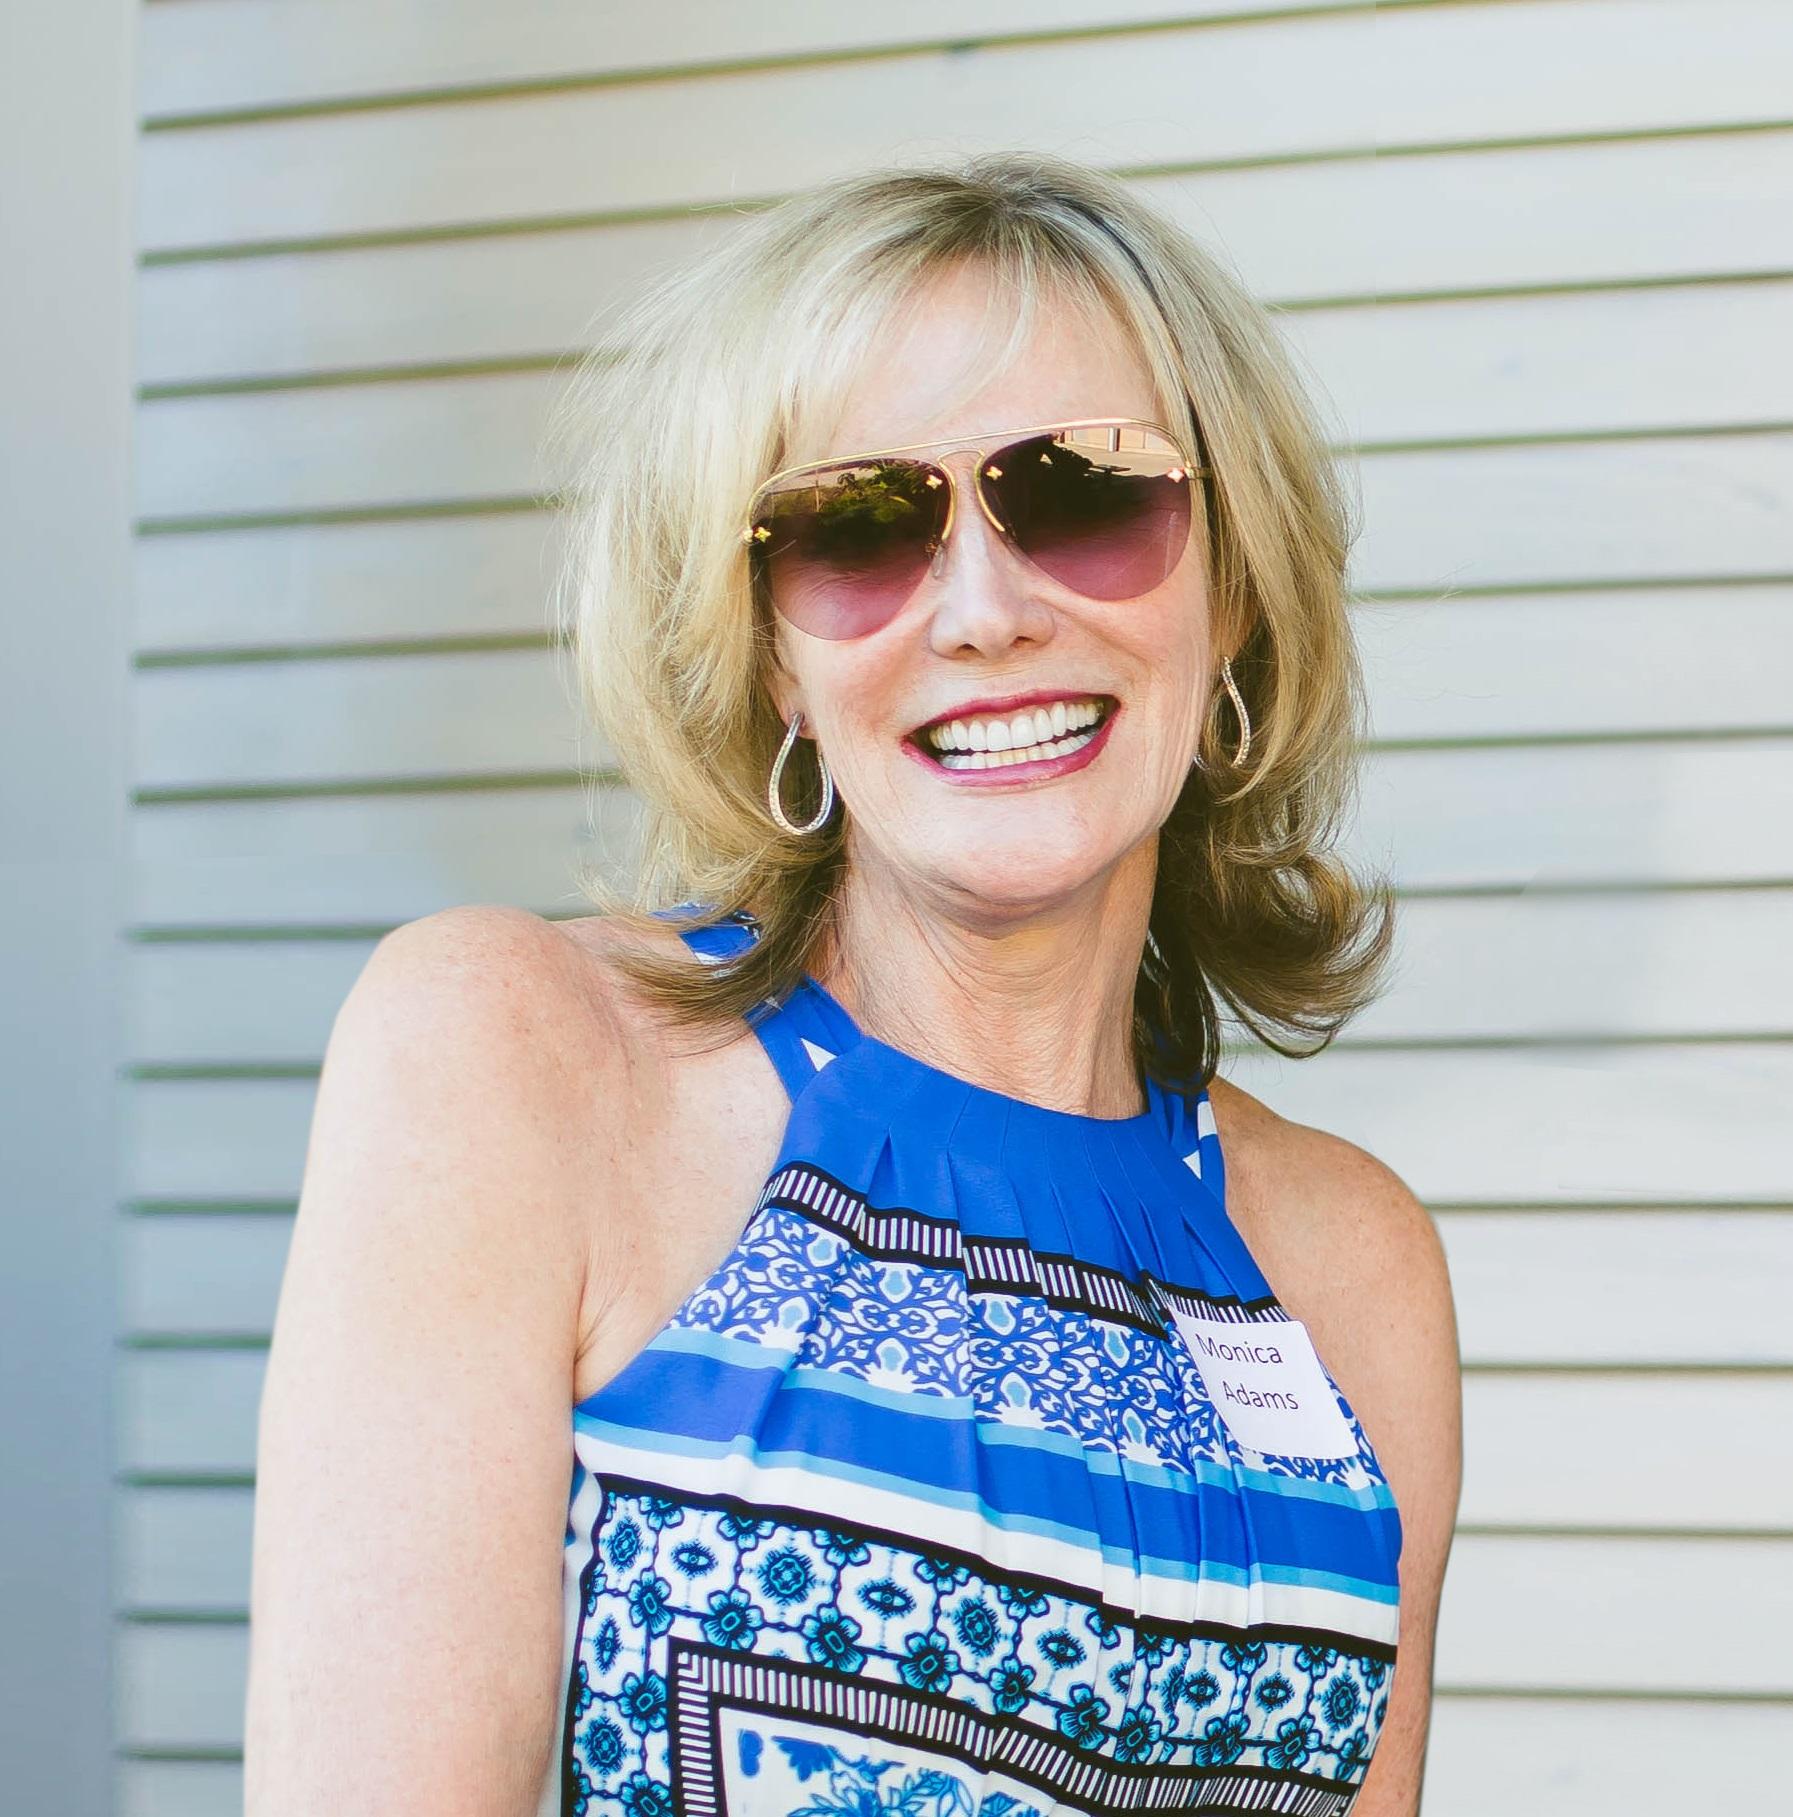 Monica Adams, Recipient of the 2019 Barbara Frederick Award